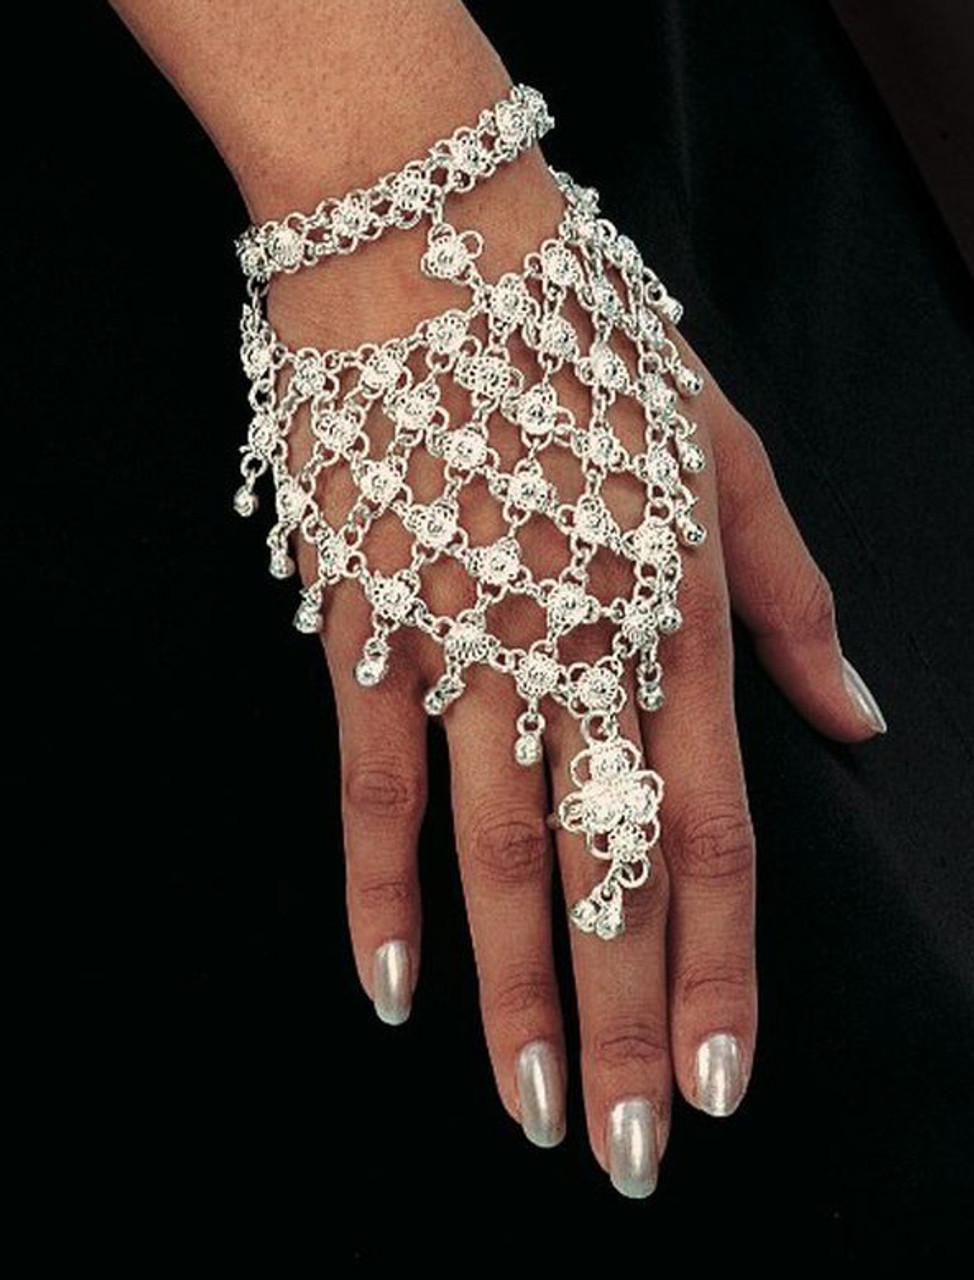 Belly Dance Hand Decoration Slave Bracelet Silver ONE SIZE